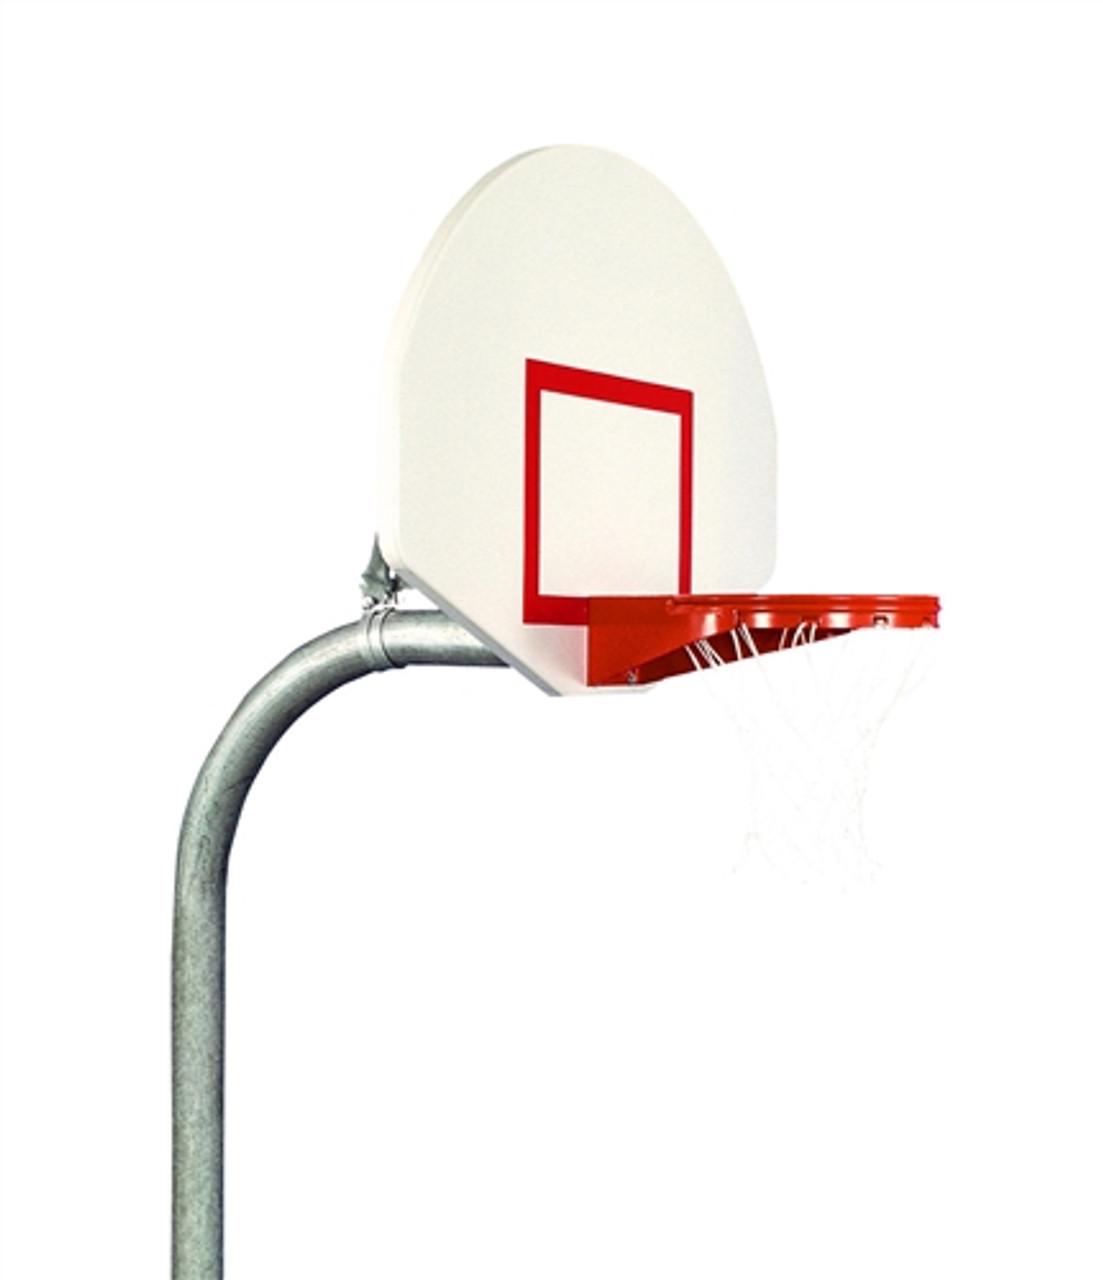 standalone basketball backboard with rim and net